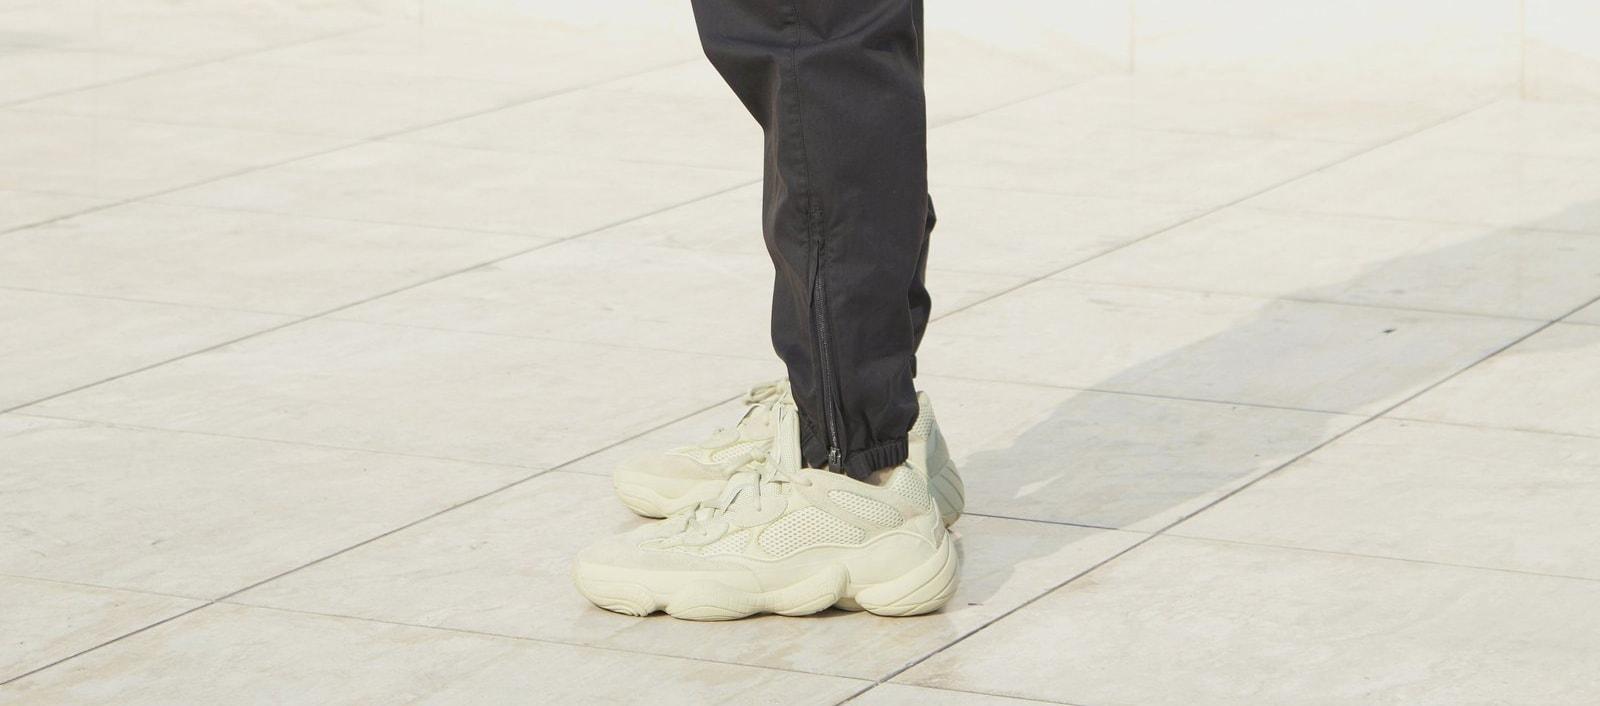 Adidas Yeezy 500 'Super Moon Yellow' (On-Foot Left)